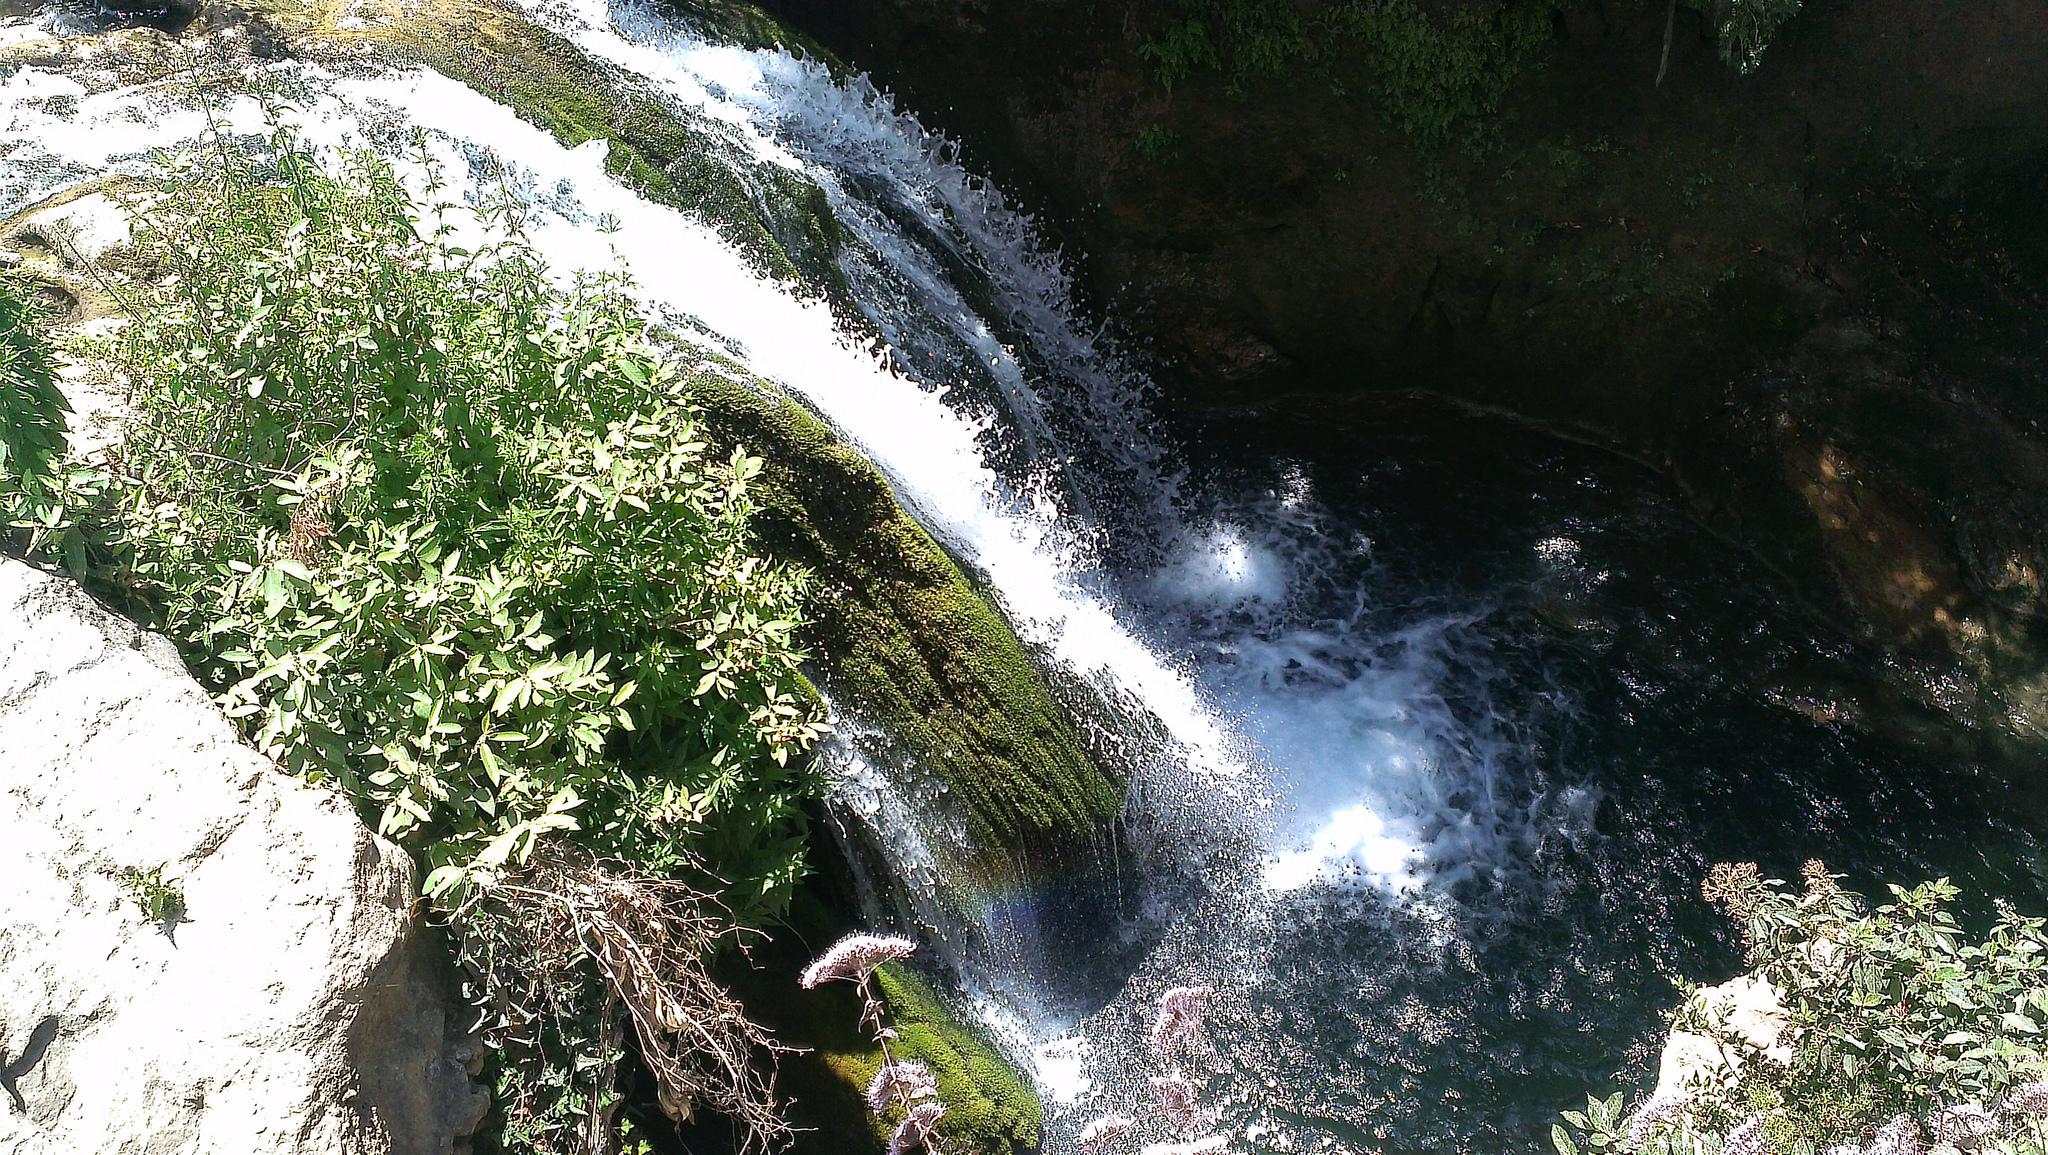 cascades Akchour maroc